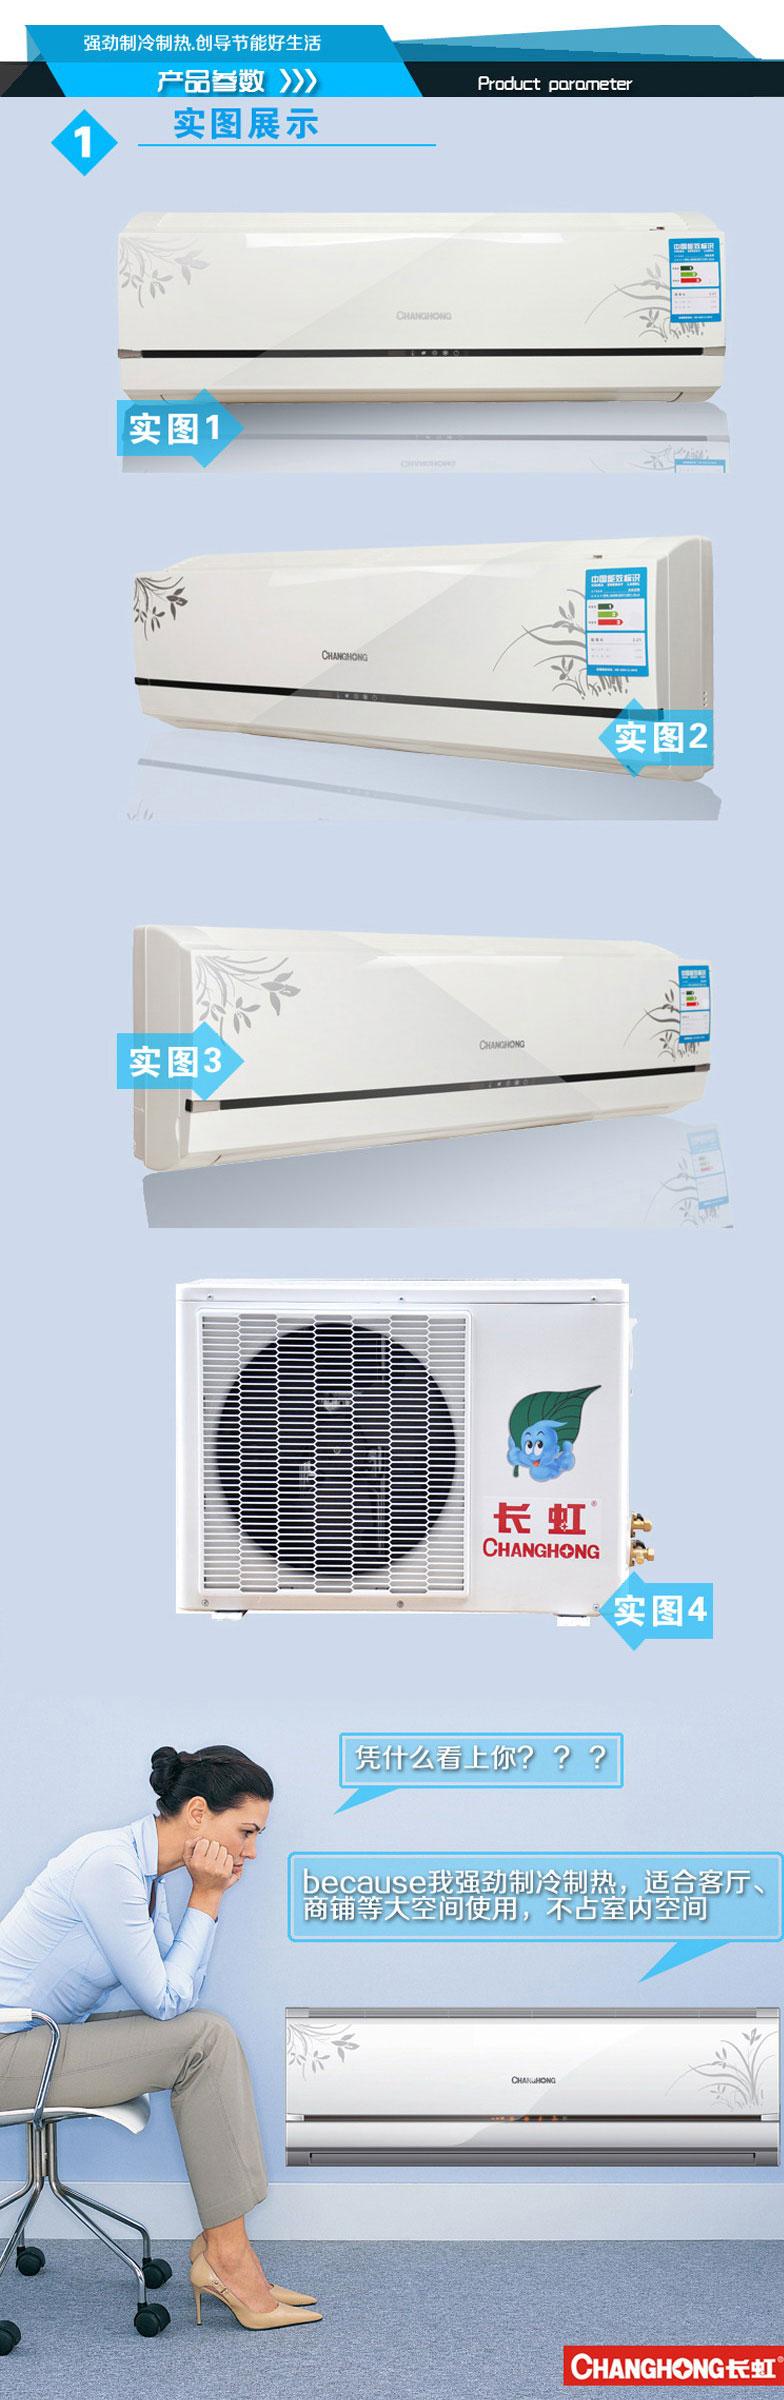 长虹空调型号:kfr-35gw/dht1(w1-h)+2